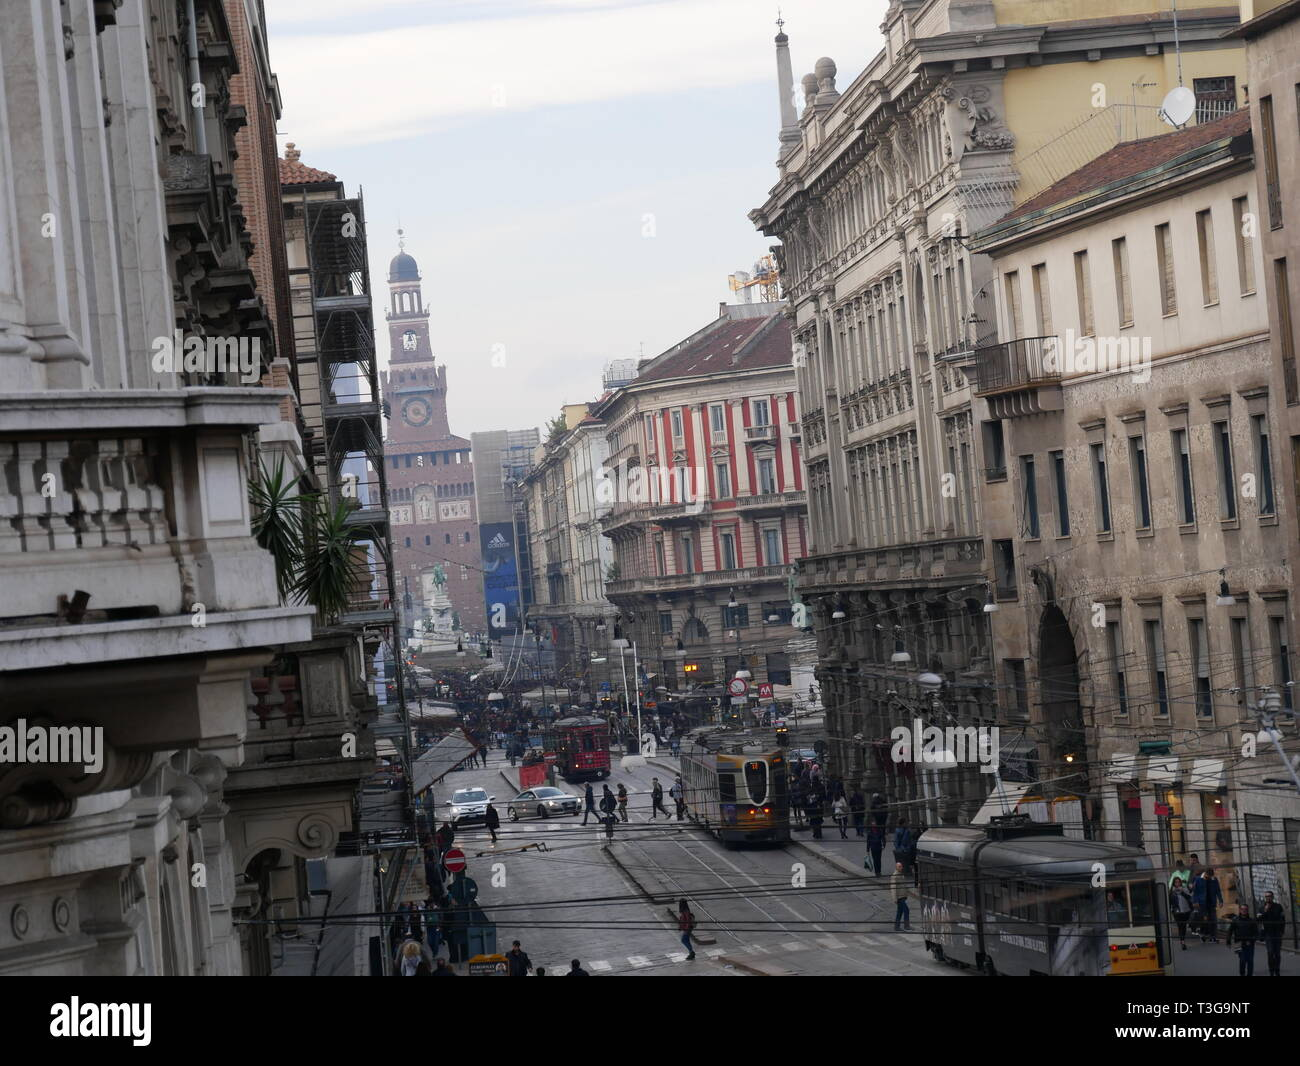 Italian vibrant sreet near city center - Stock Image